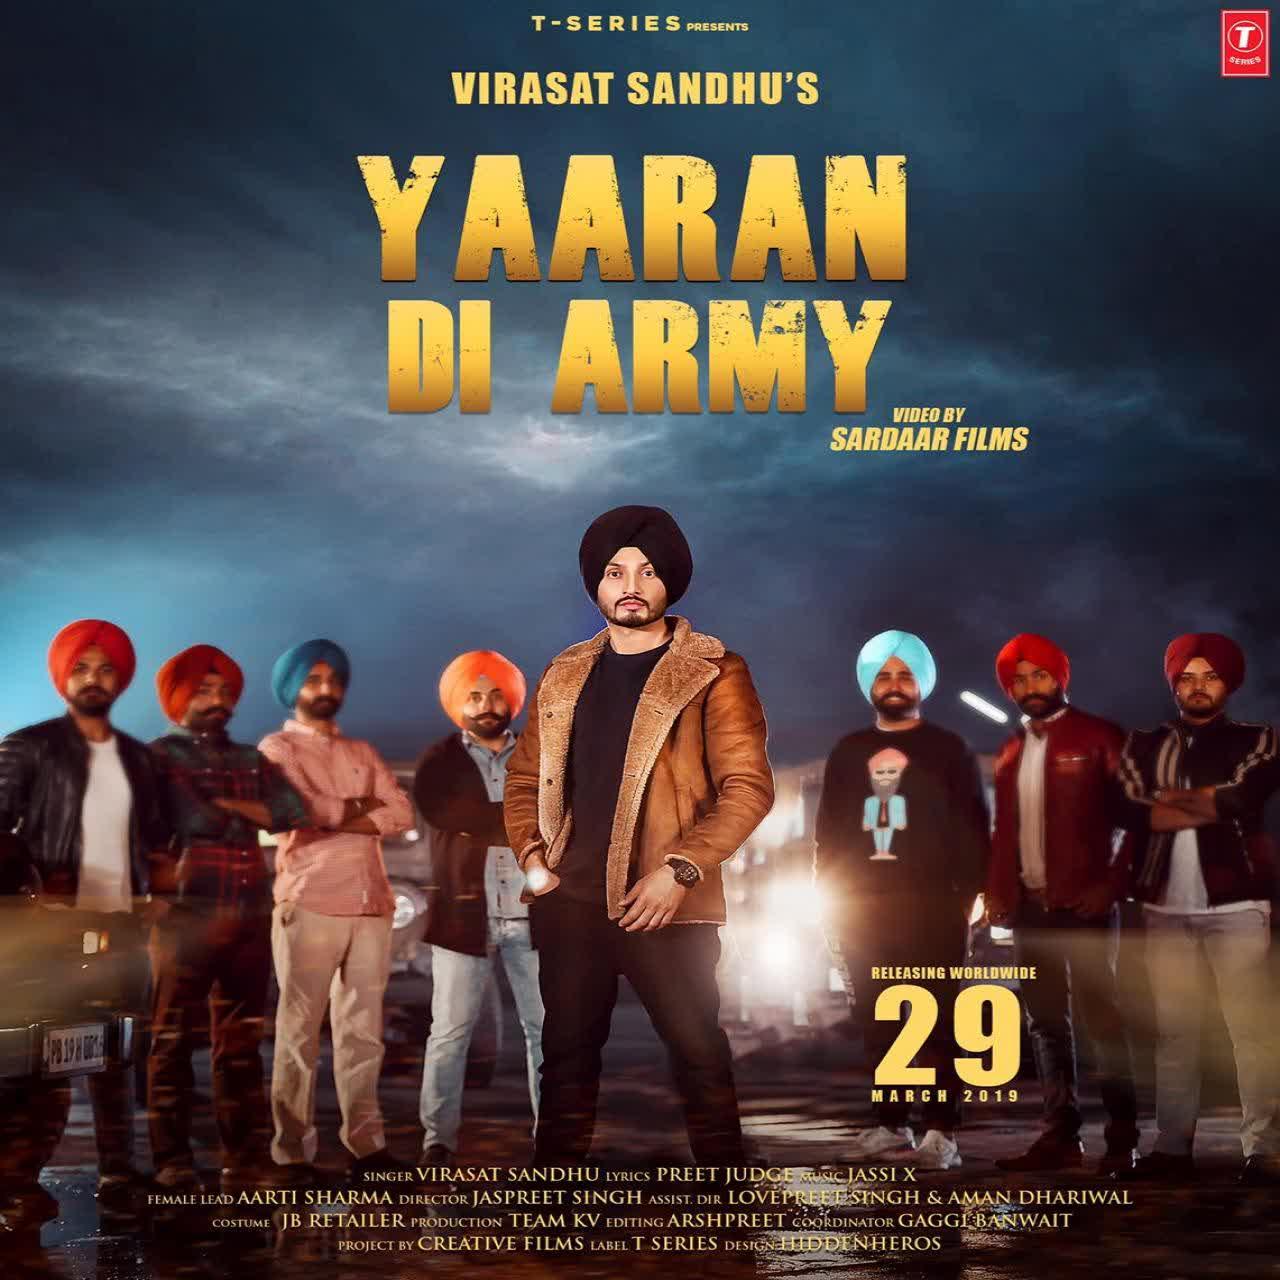 https://cover.djpunjab.org/45046/300x250/Yaaran_Di_Army_Virasat_Sandhu.jpg